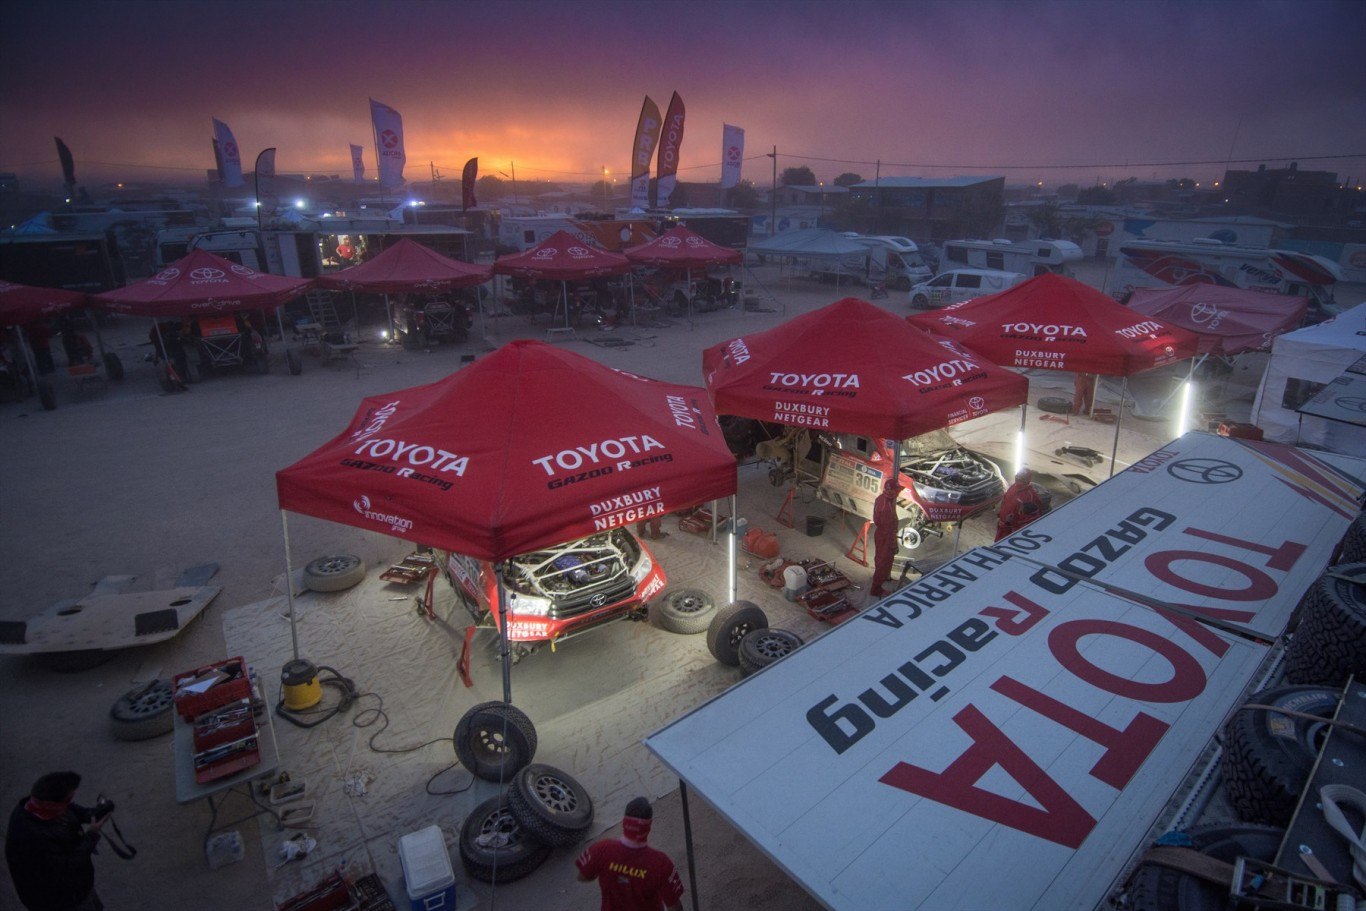 Service crews busy as race crews enjoy a rest day in Dakar 2016